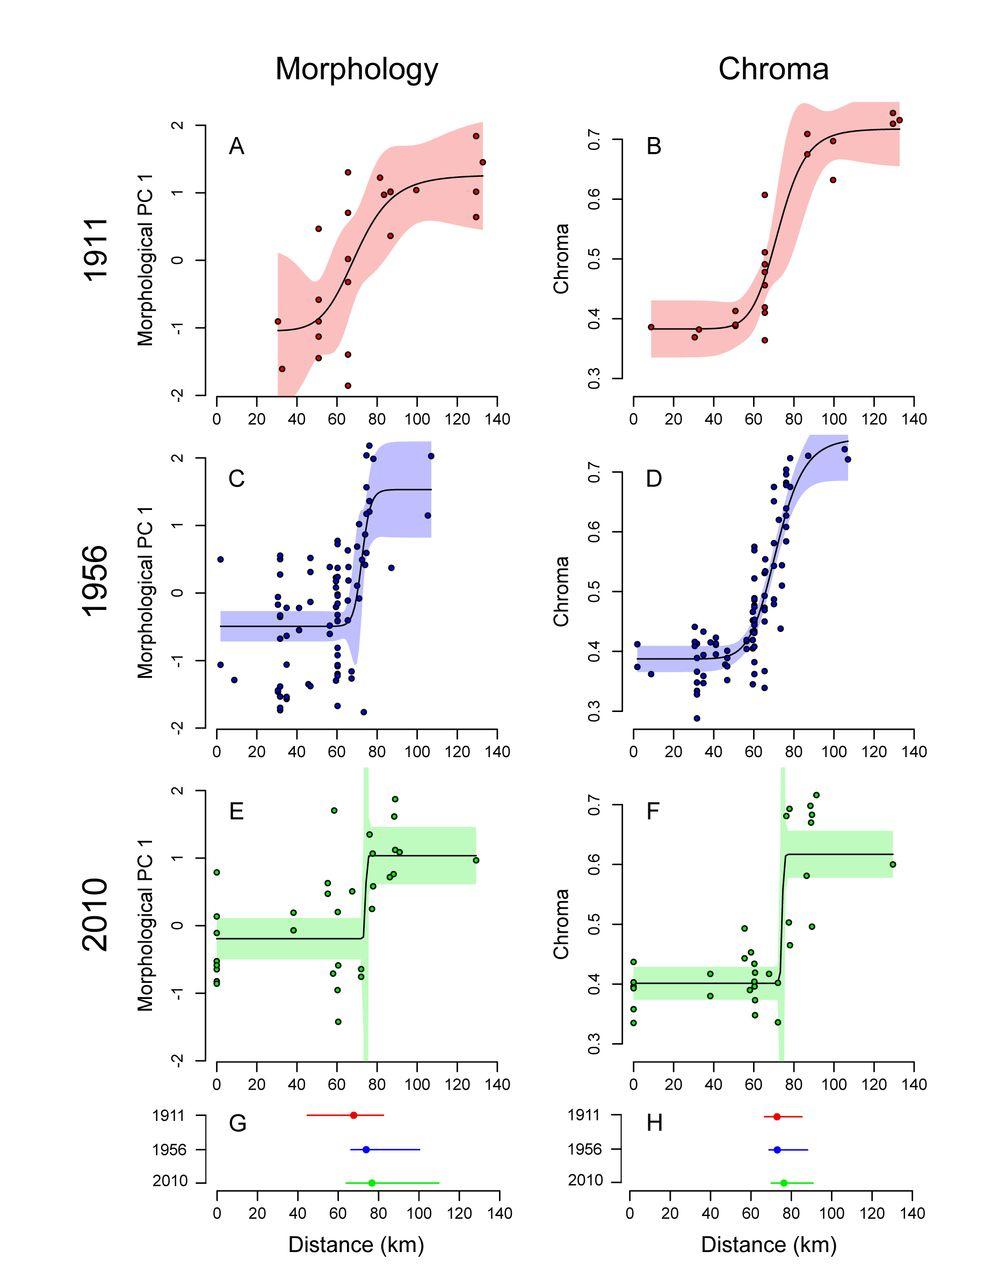 Origin And Crosscentury Dynamics Of An Avian Hybrid Zone inside Body Beast Max 30 Hybrid